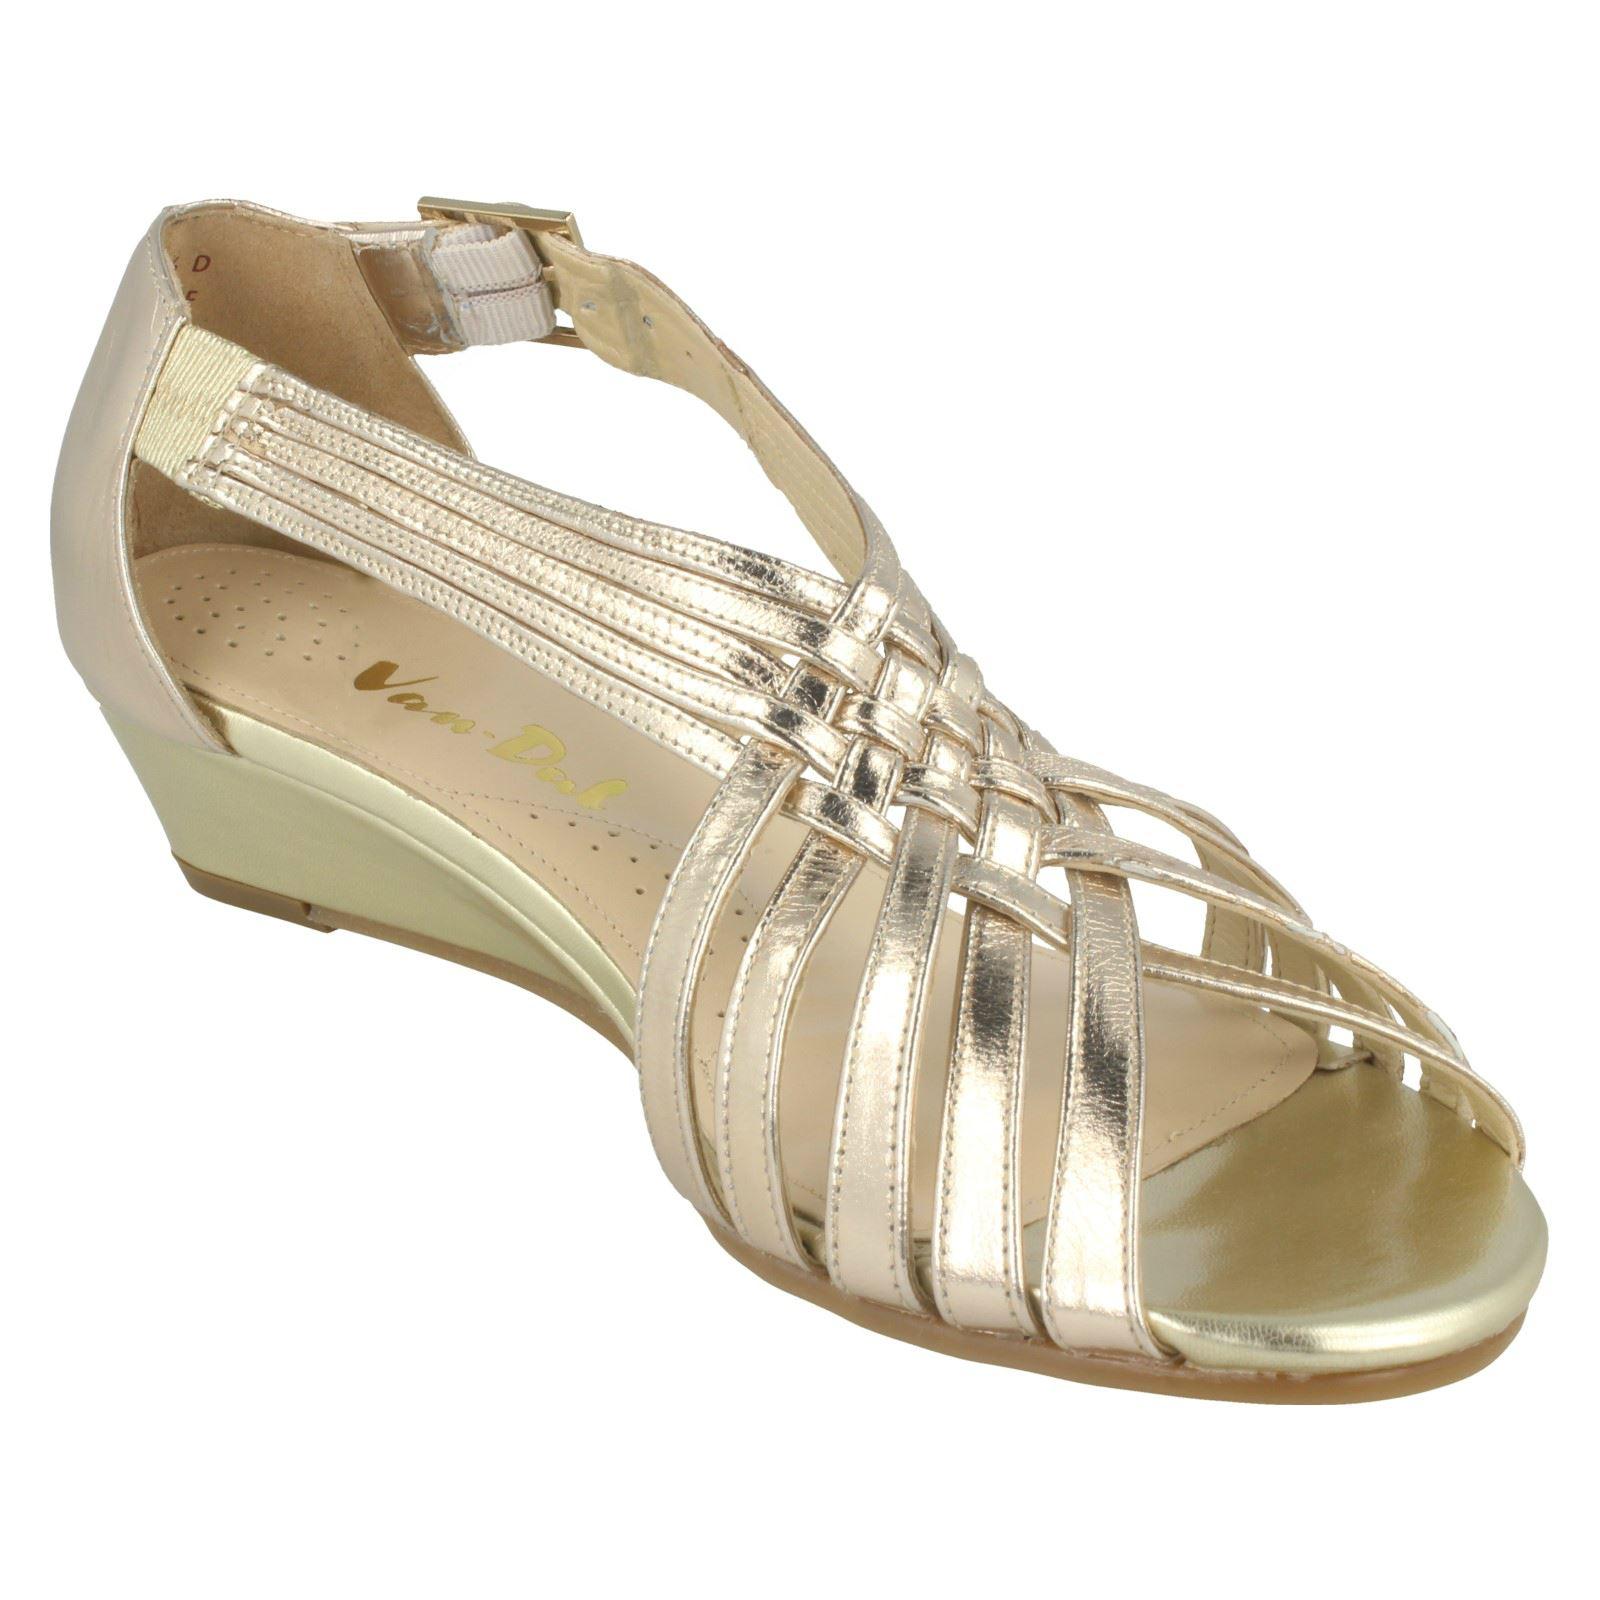 Ladies-Van-Dal-Wedge-Strappy-Sandals-Lucie thumbnail 26